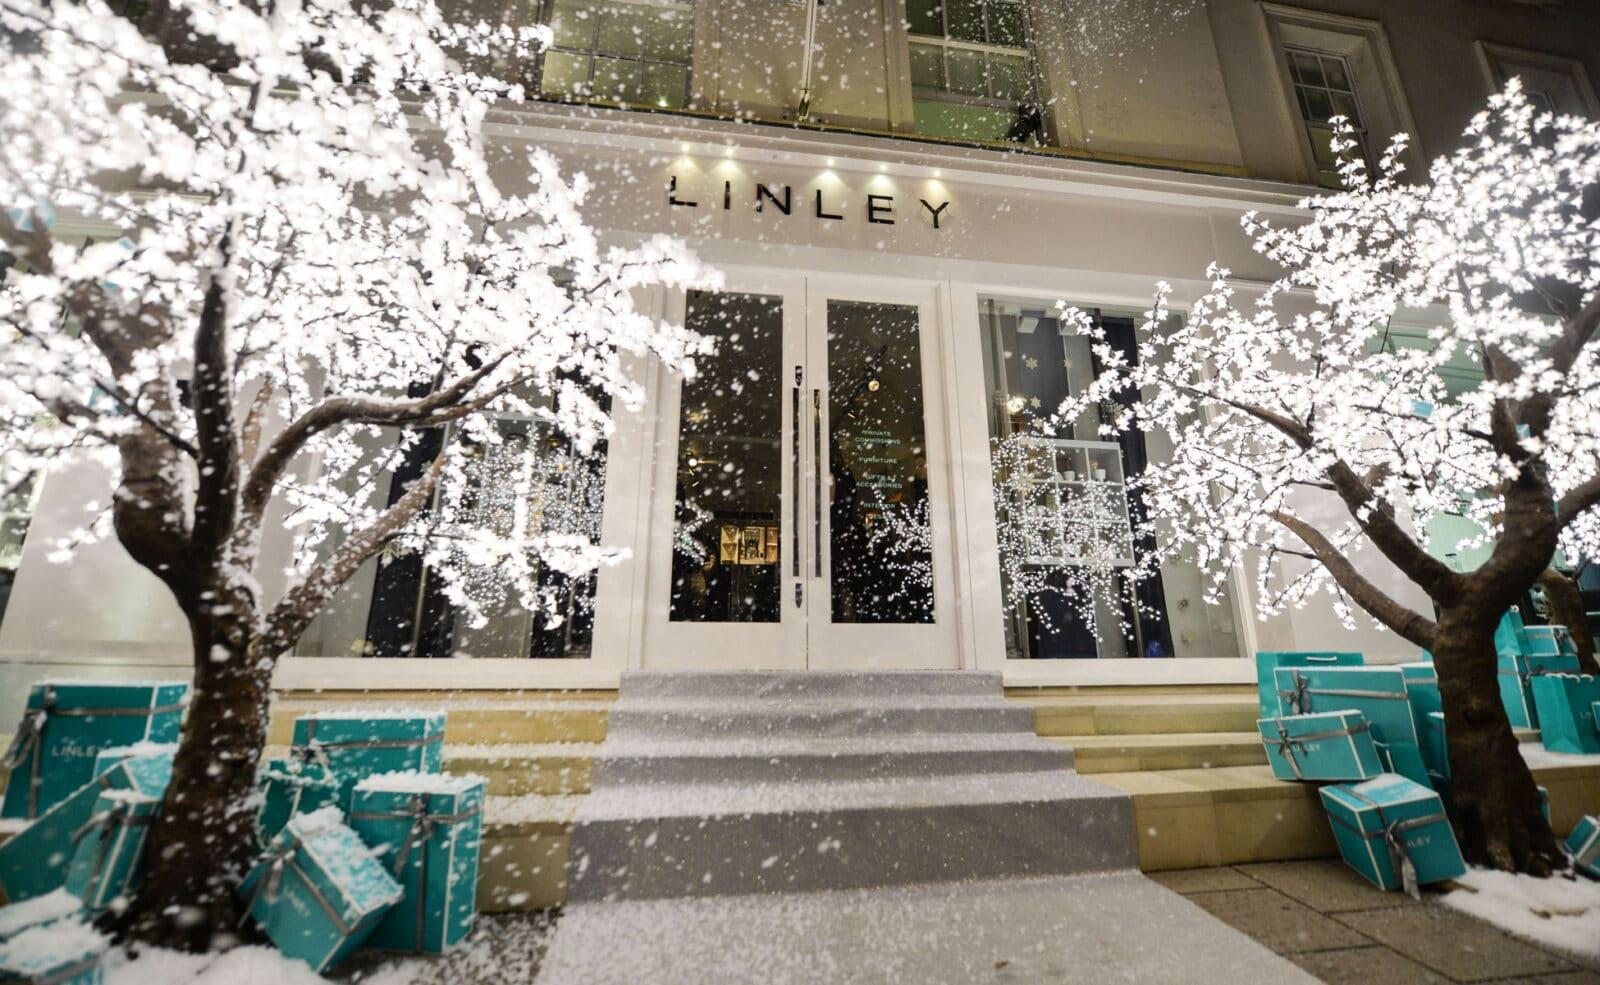 Linley slide